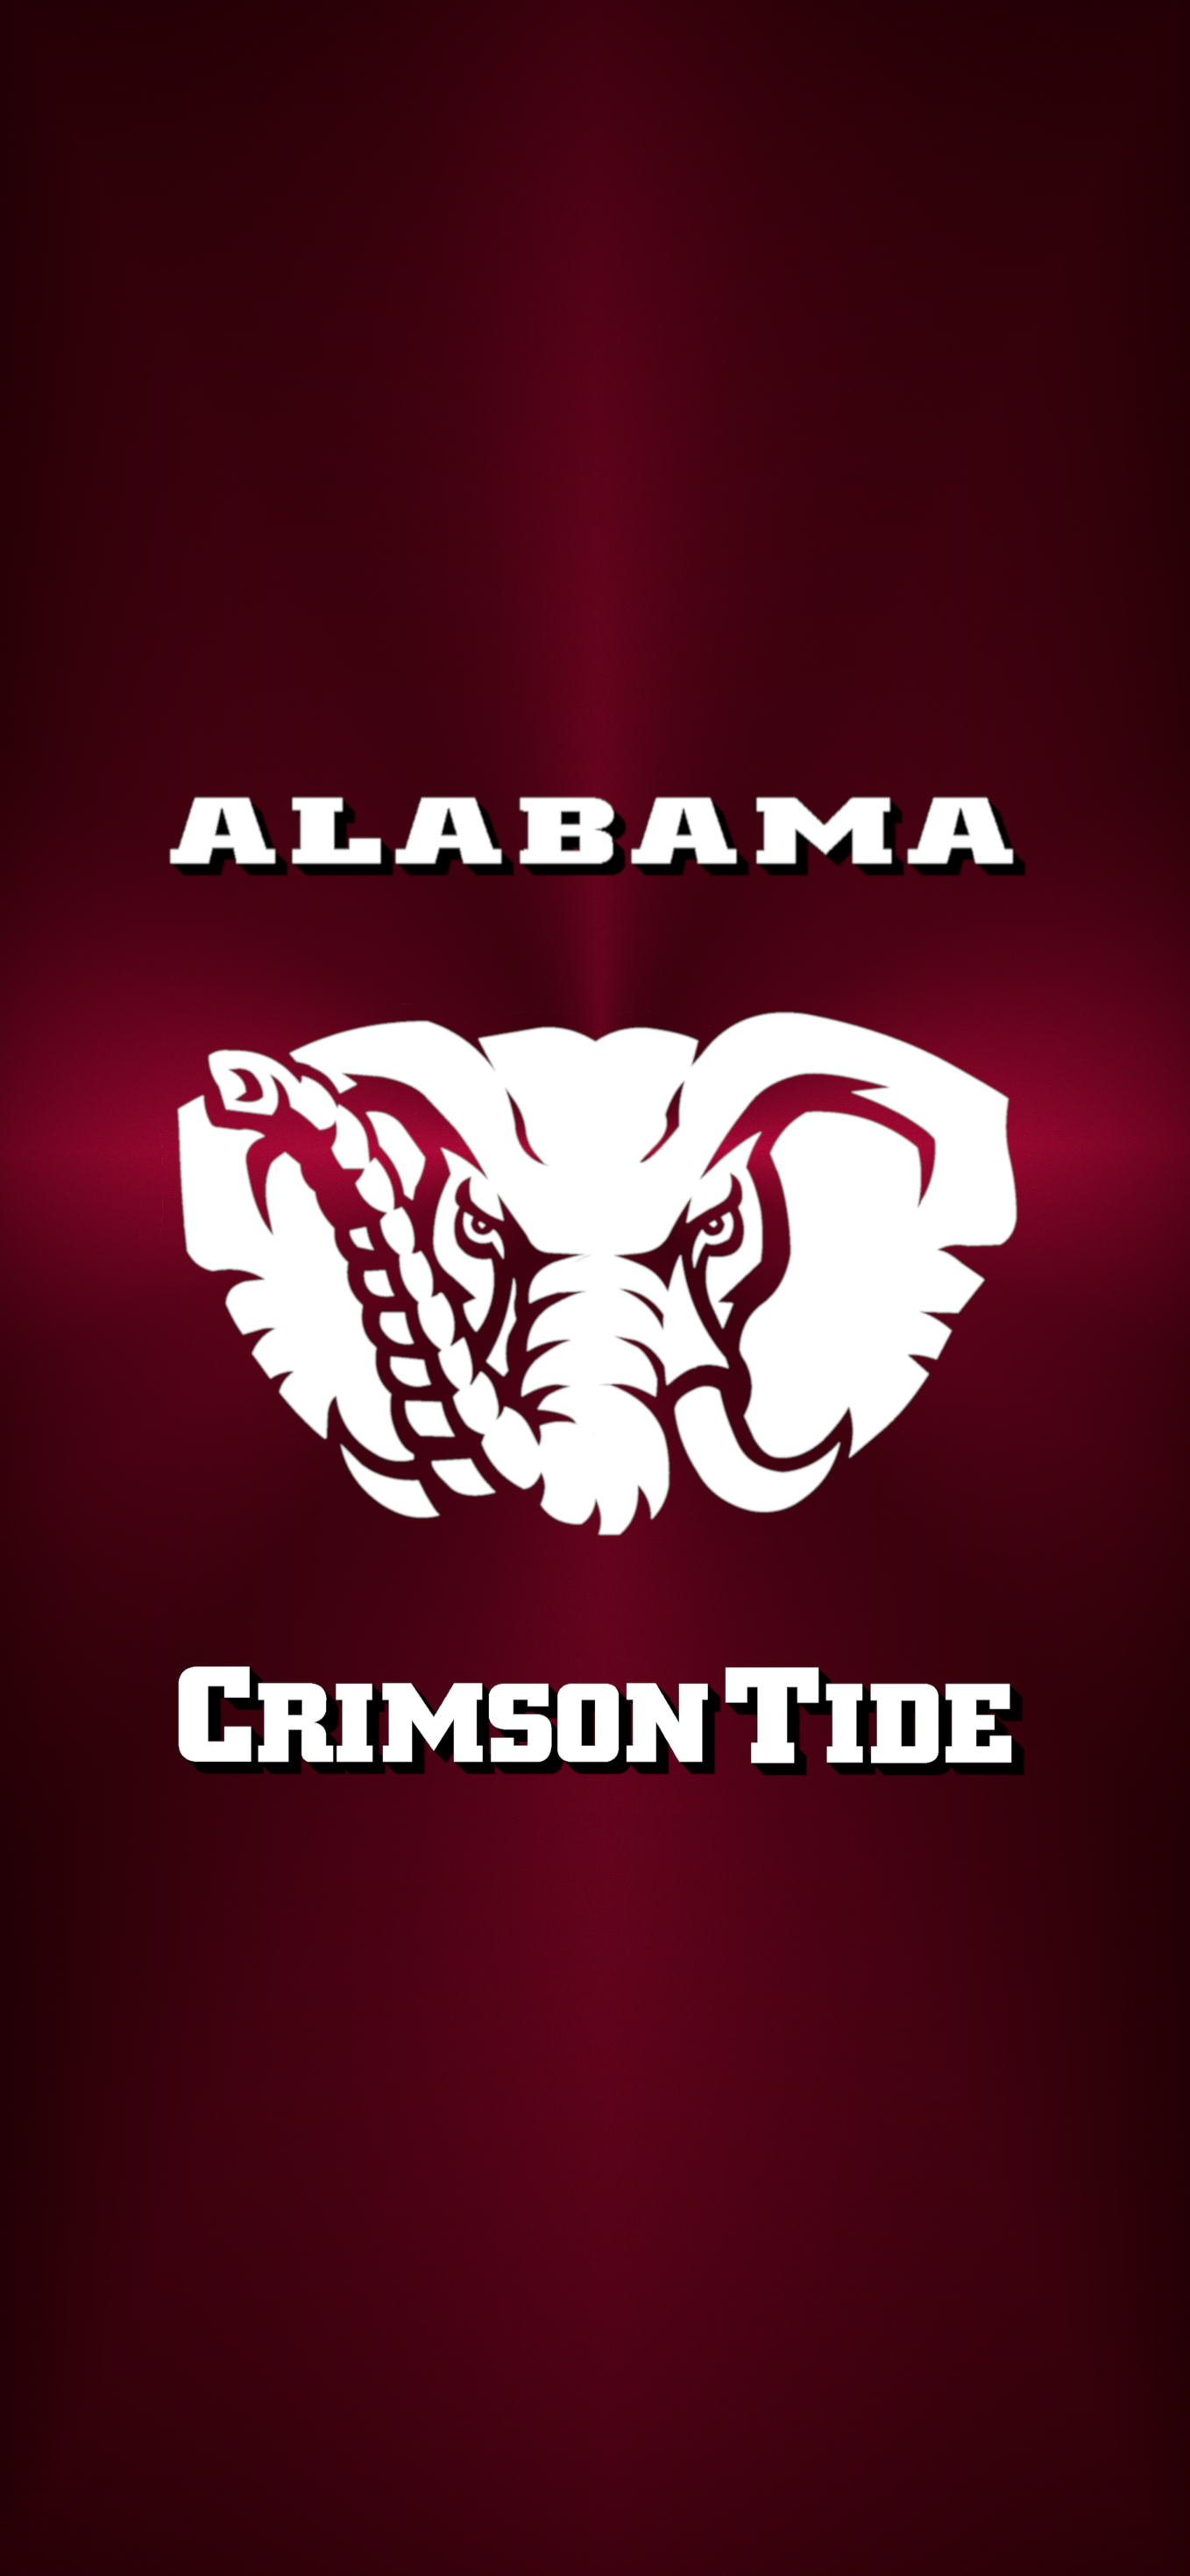 Bama Logo 2 Metal Alabama Crimson Tide Logo Alabama Crimson Tide Football Wallpaper Alabama Crimson Tide